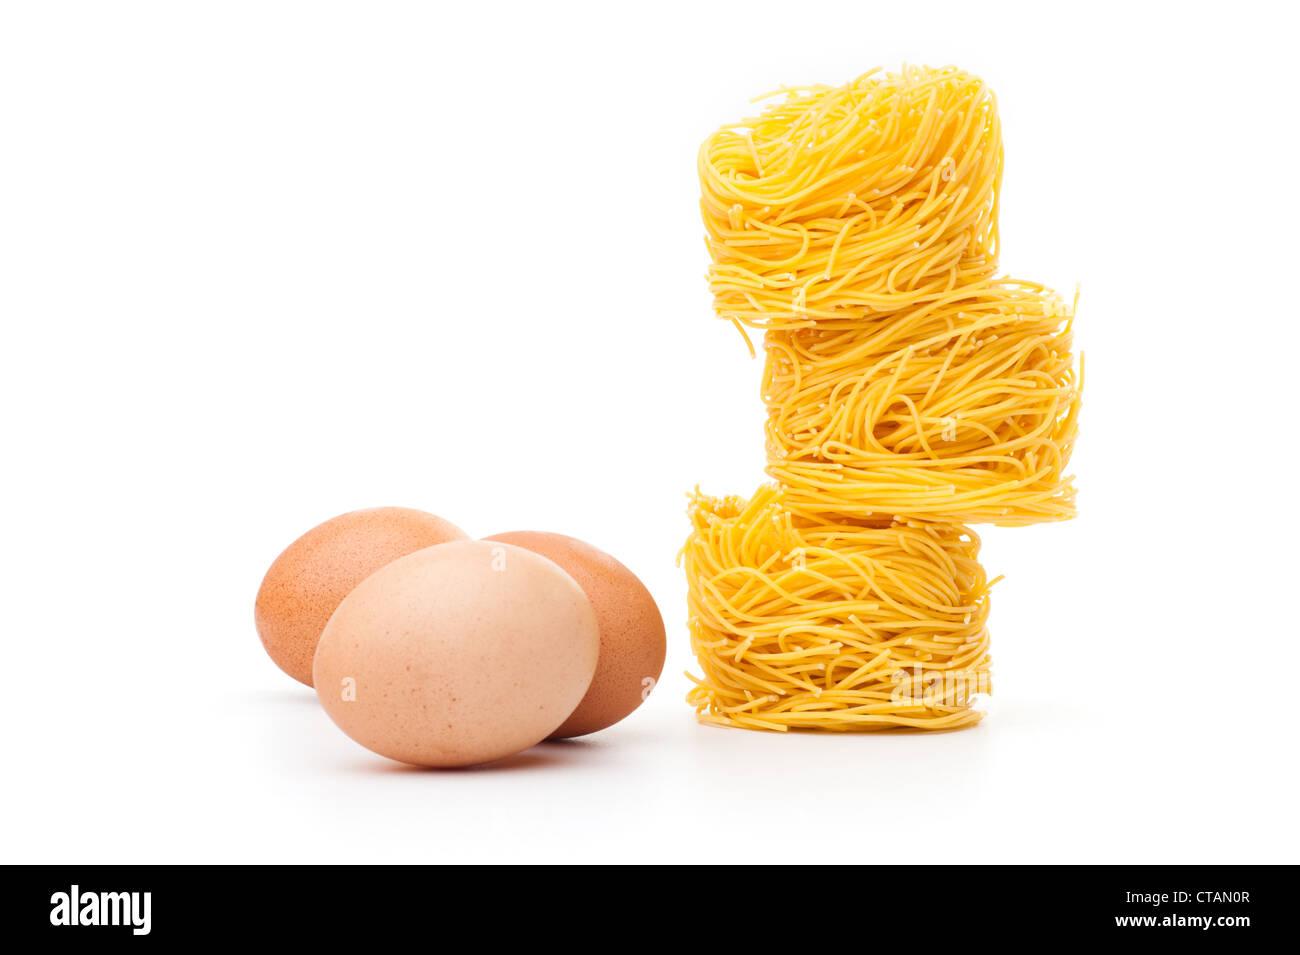 Fresh unprepared noodles and eggs - Stock Image